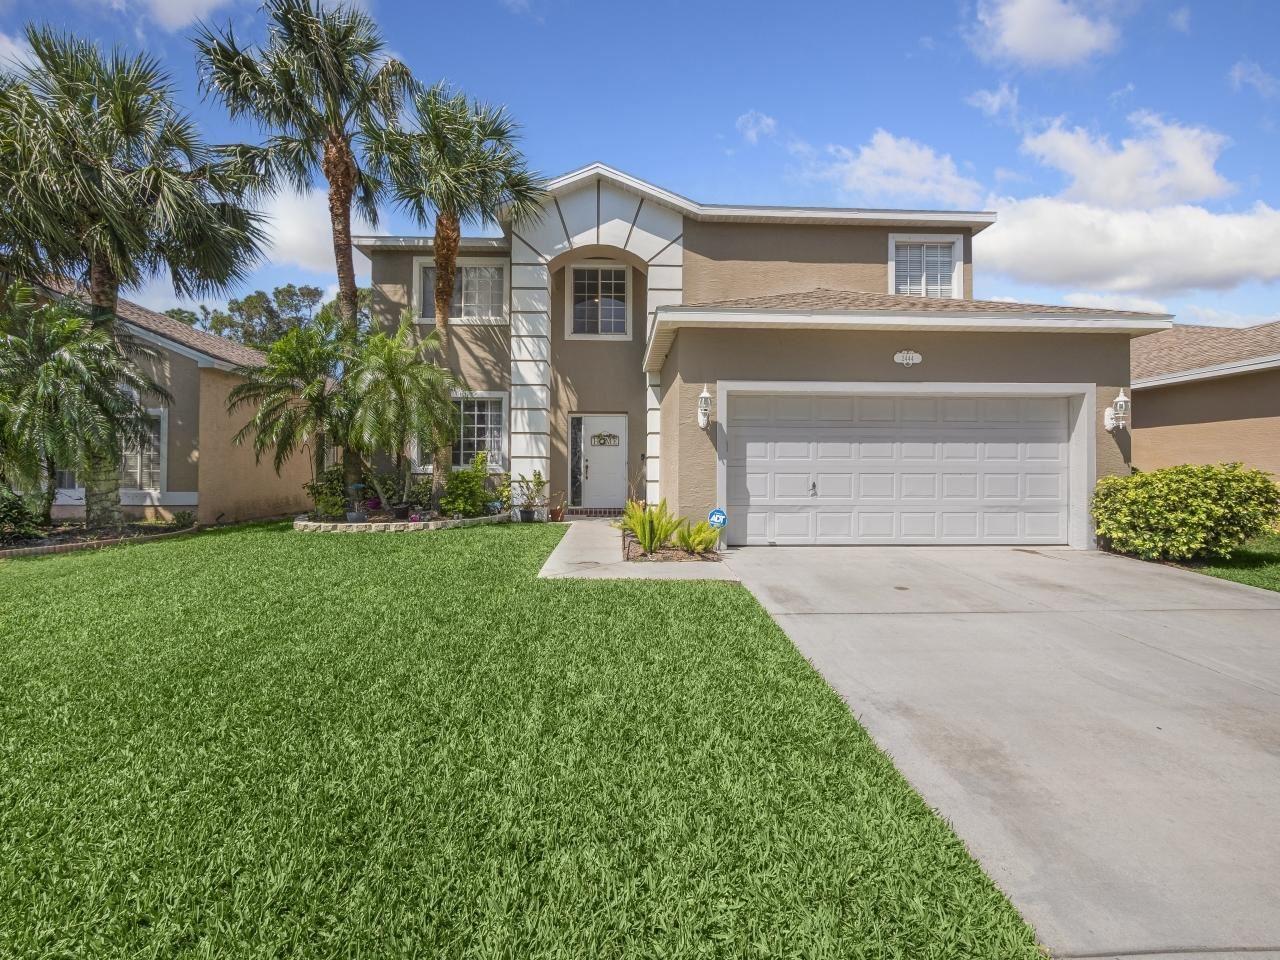 2444 SE Springtree Place, Stuart, FL 34997 - #: RX-10708572